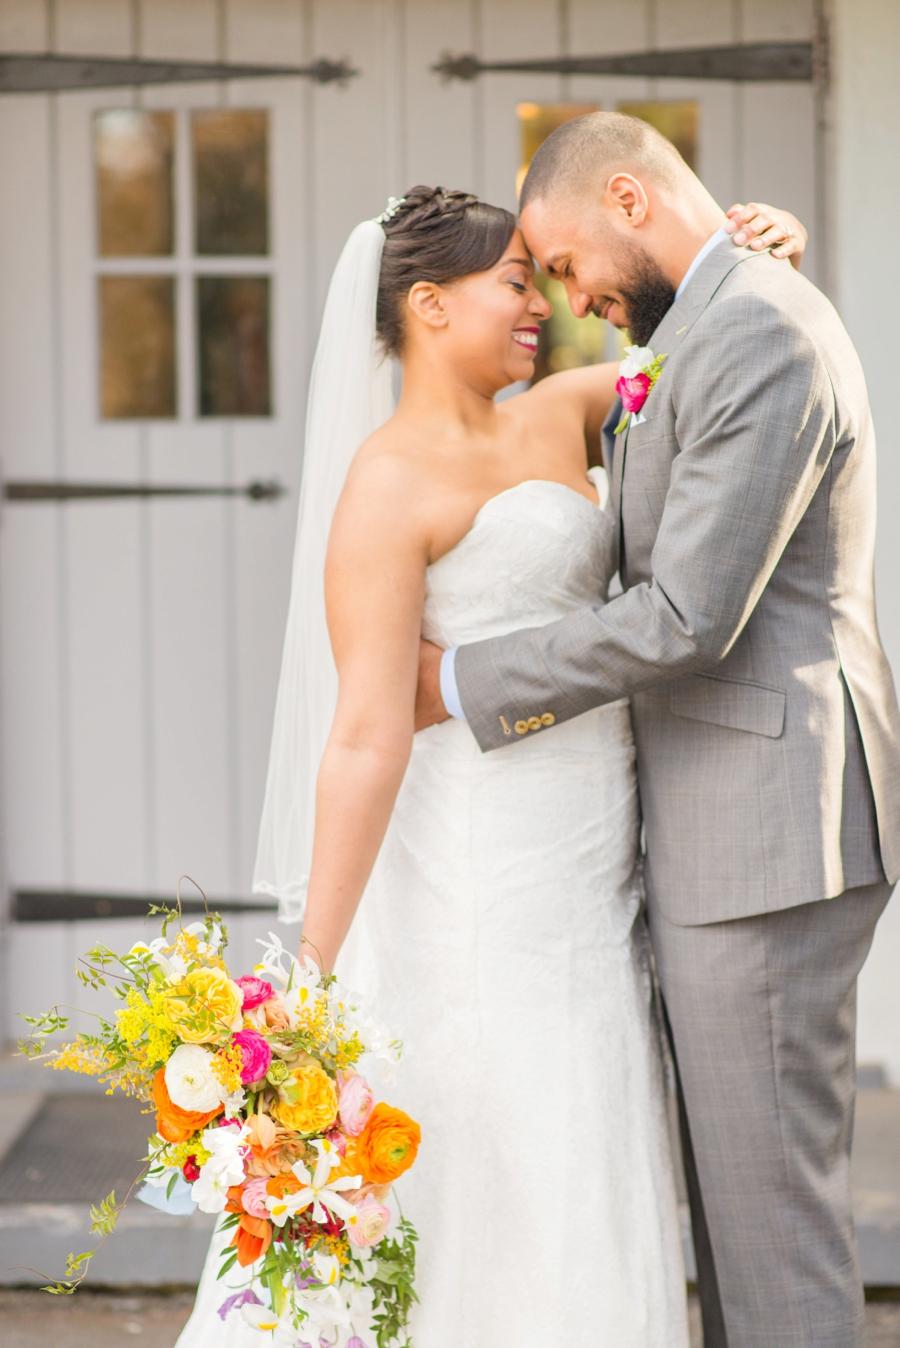 Colorful Mid Century Modern Wedding Ideas via TheELD.com